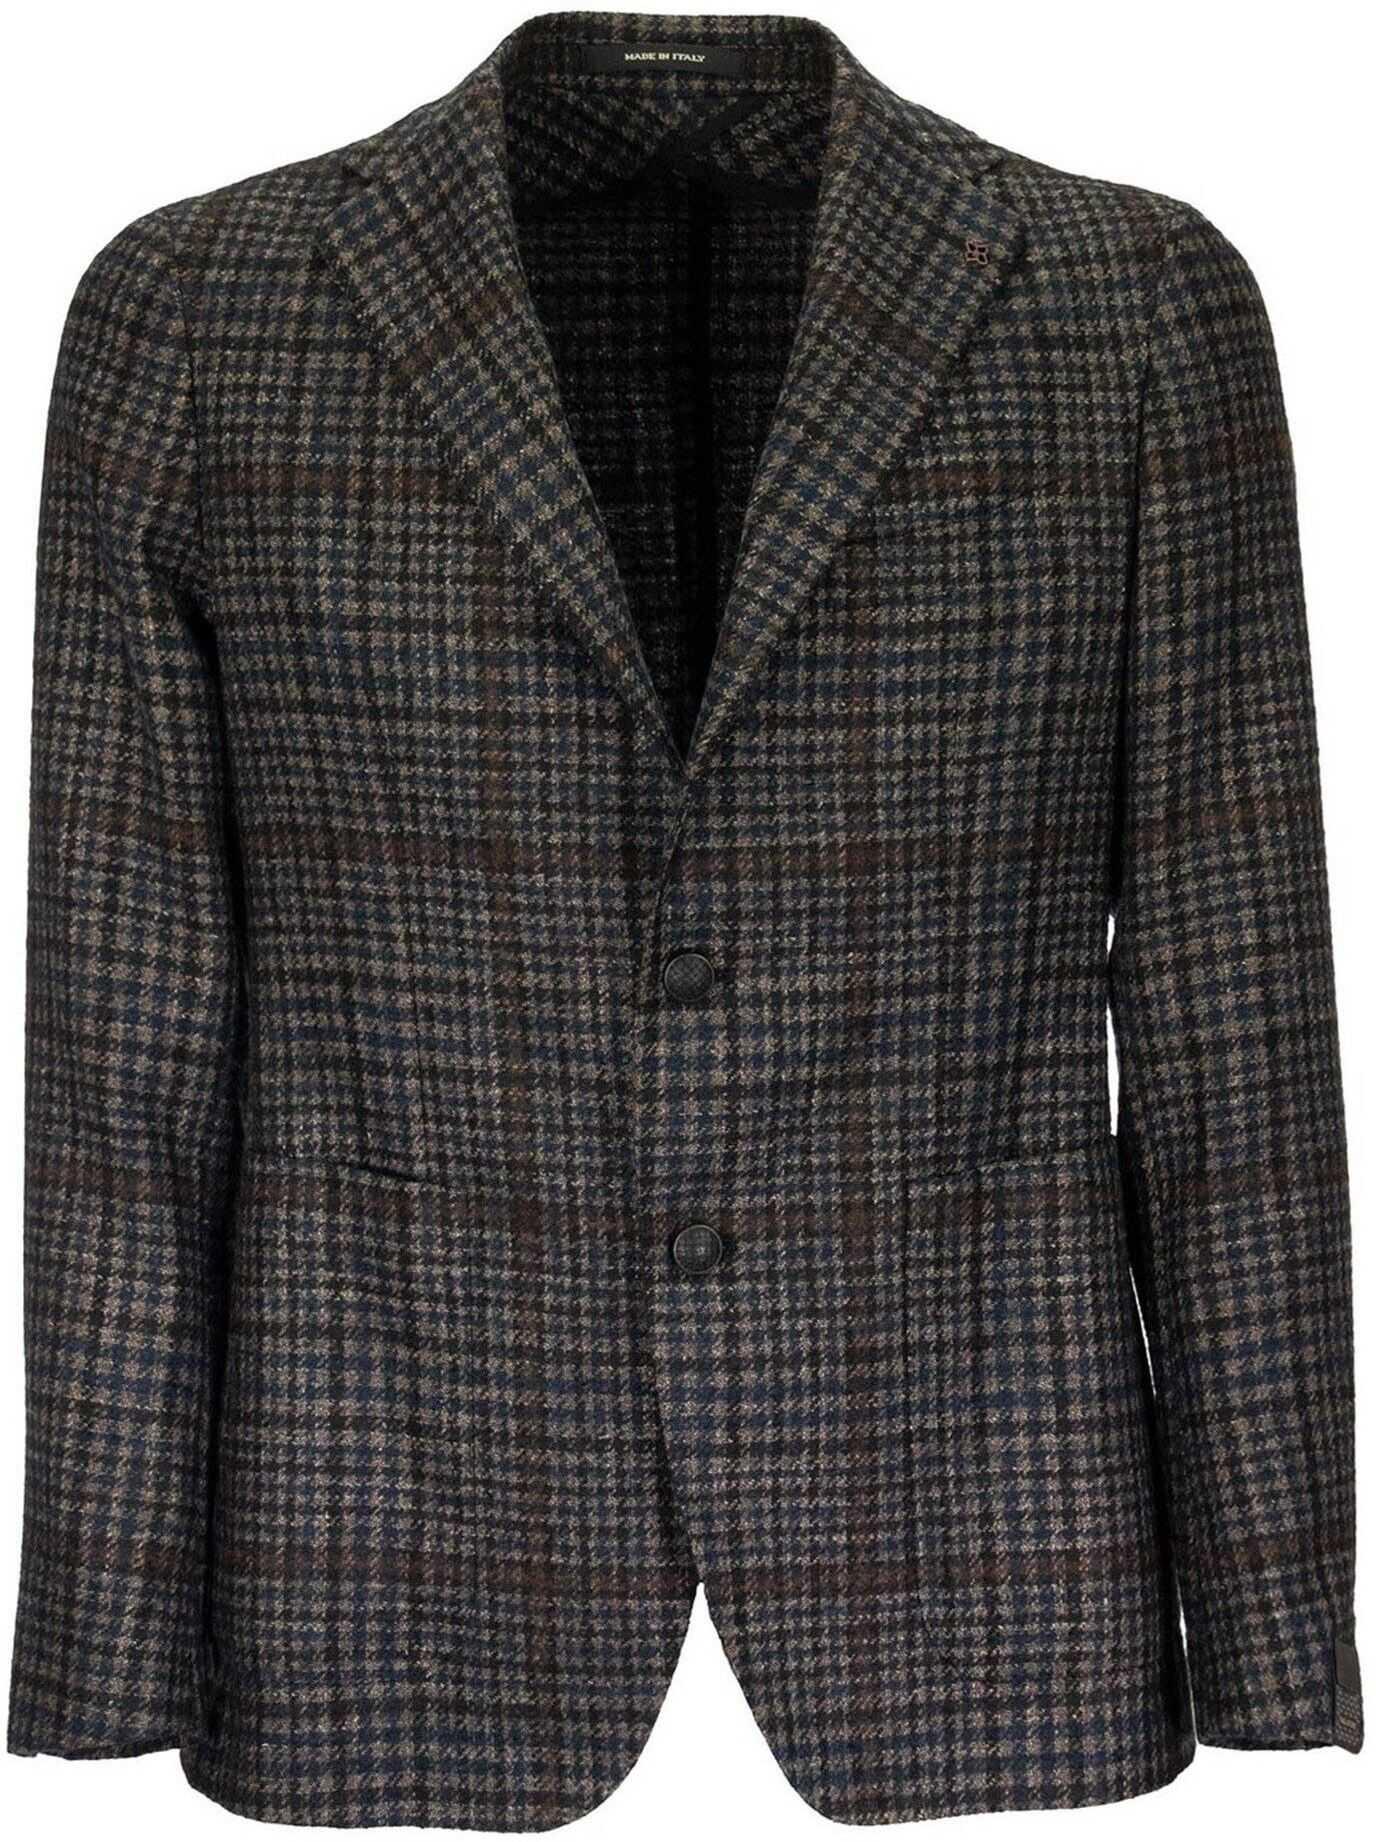 Tagliatore Prince Of Wales Patterned Blazer Multi imagine